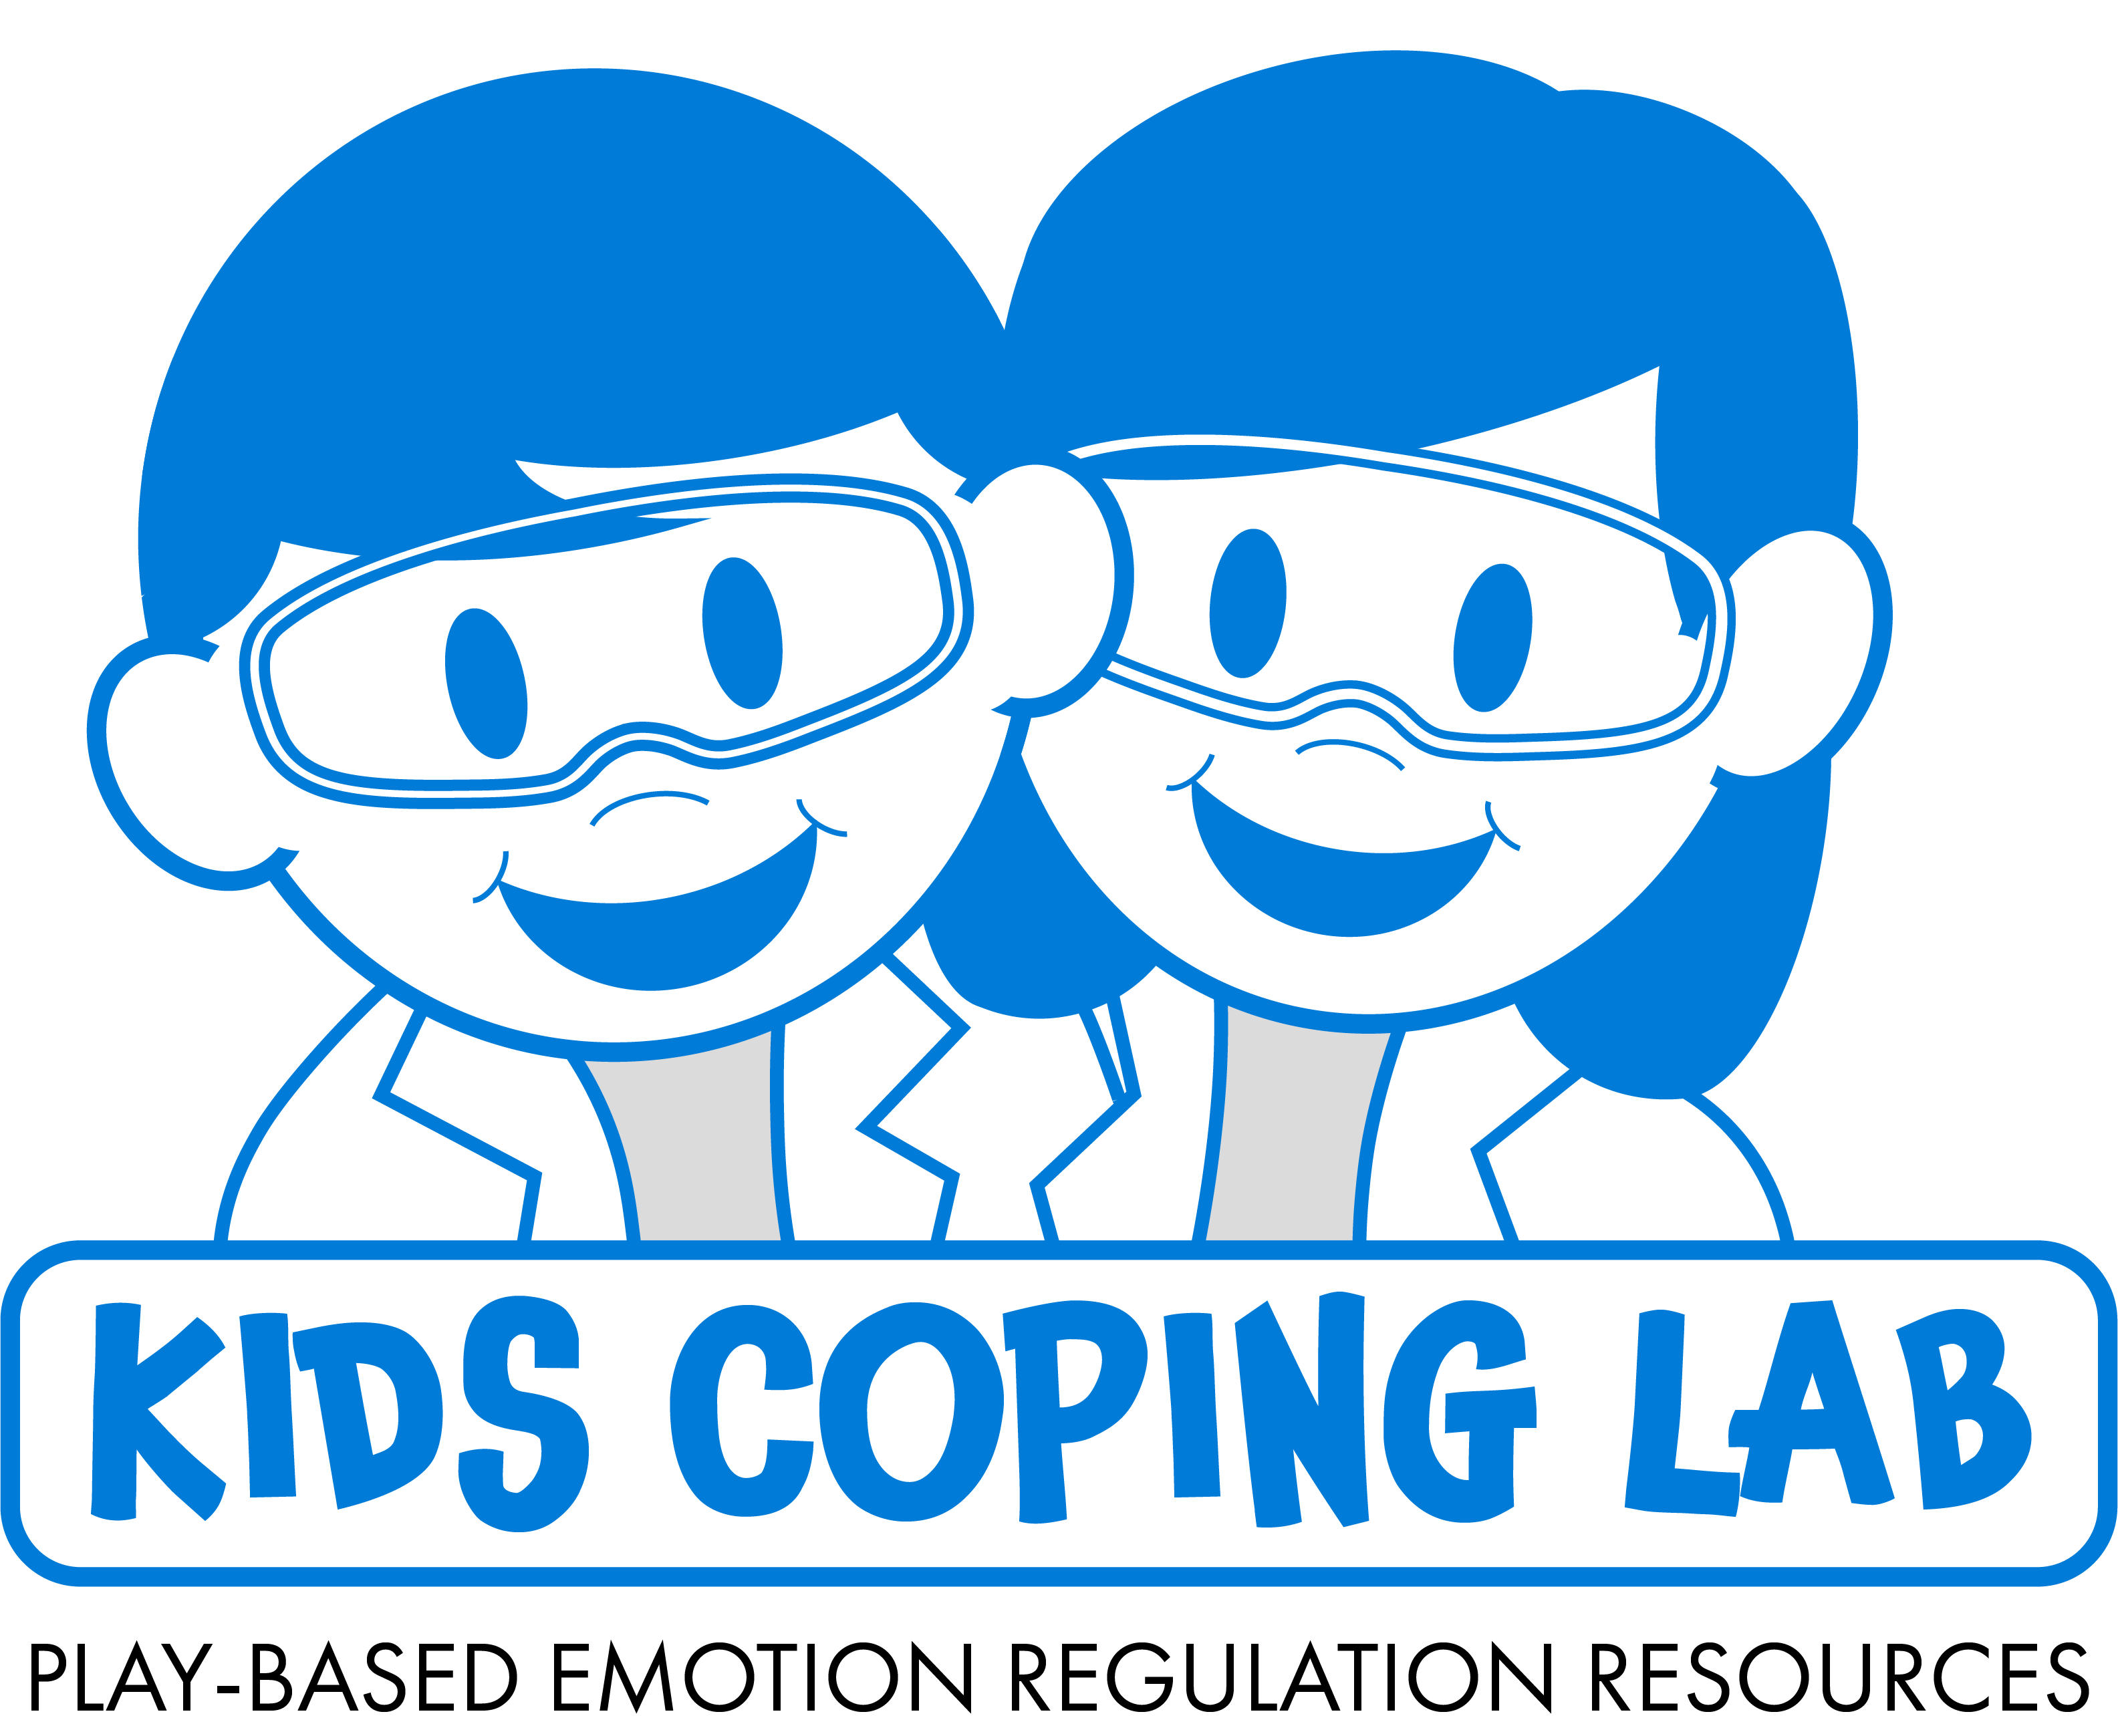 Kids Coping Lab